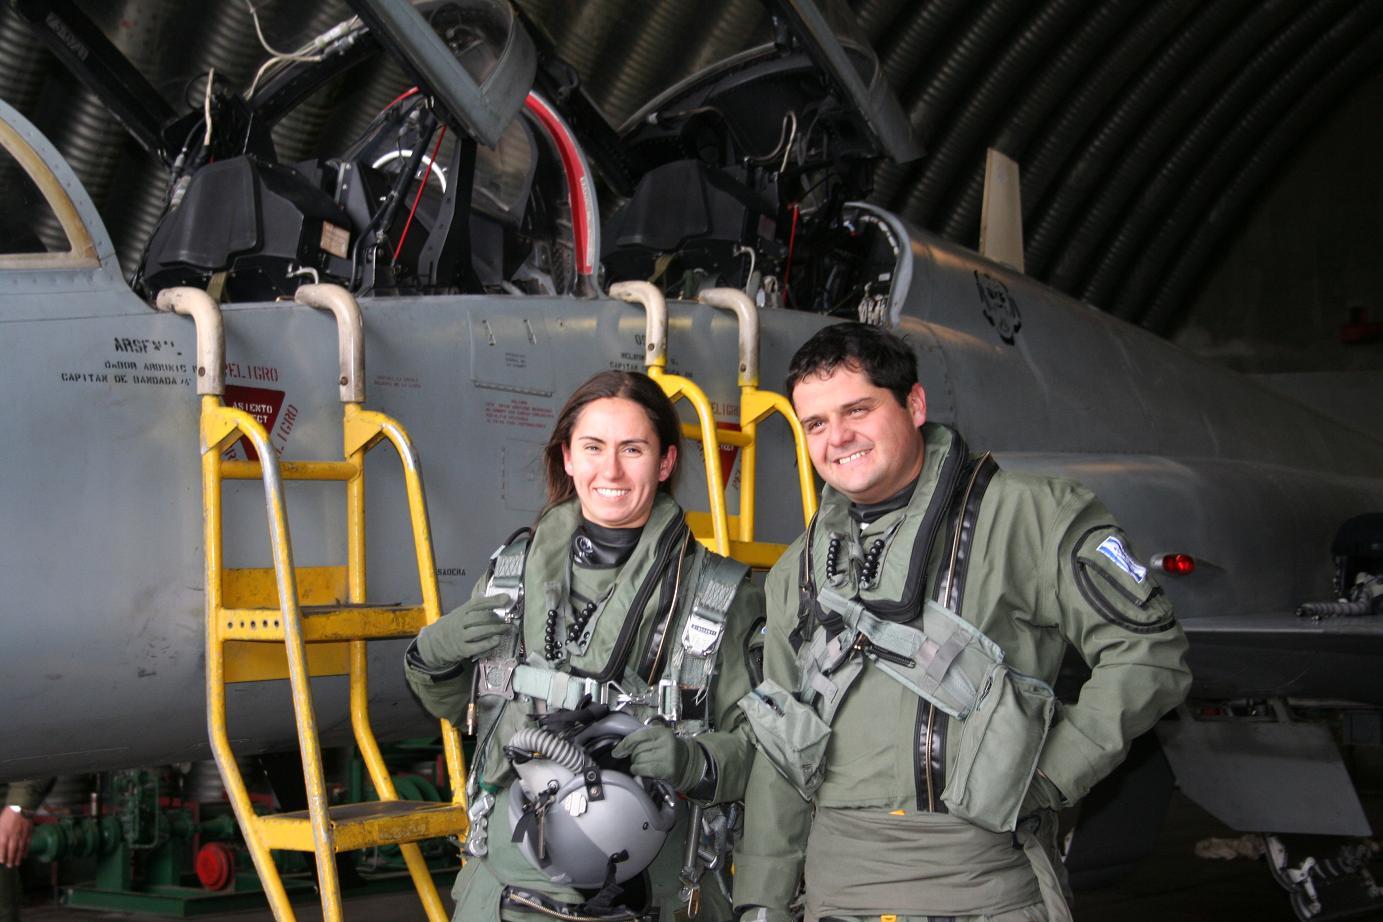 Tenente Miranda - primeira piloto supersônica da FACH - foto 1 FACH